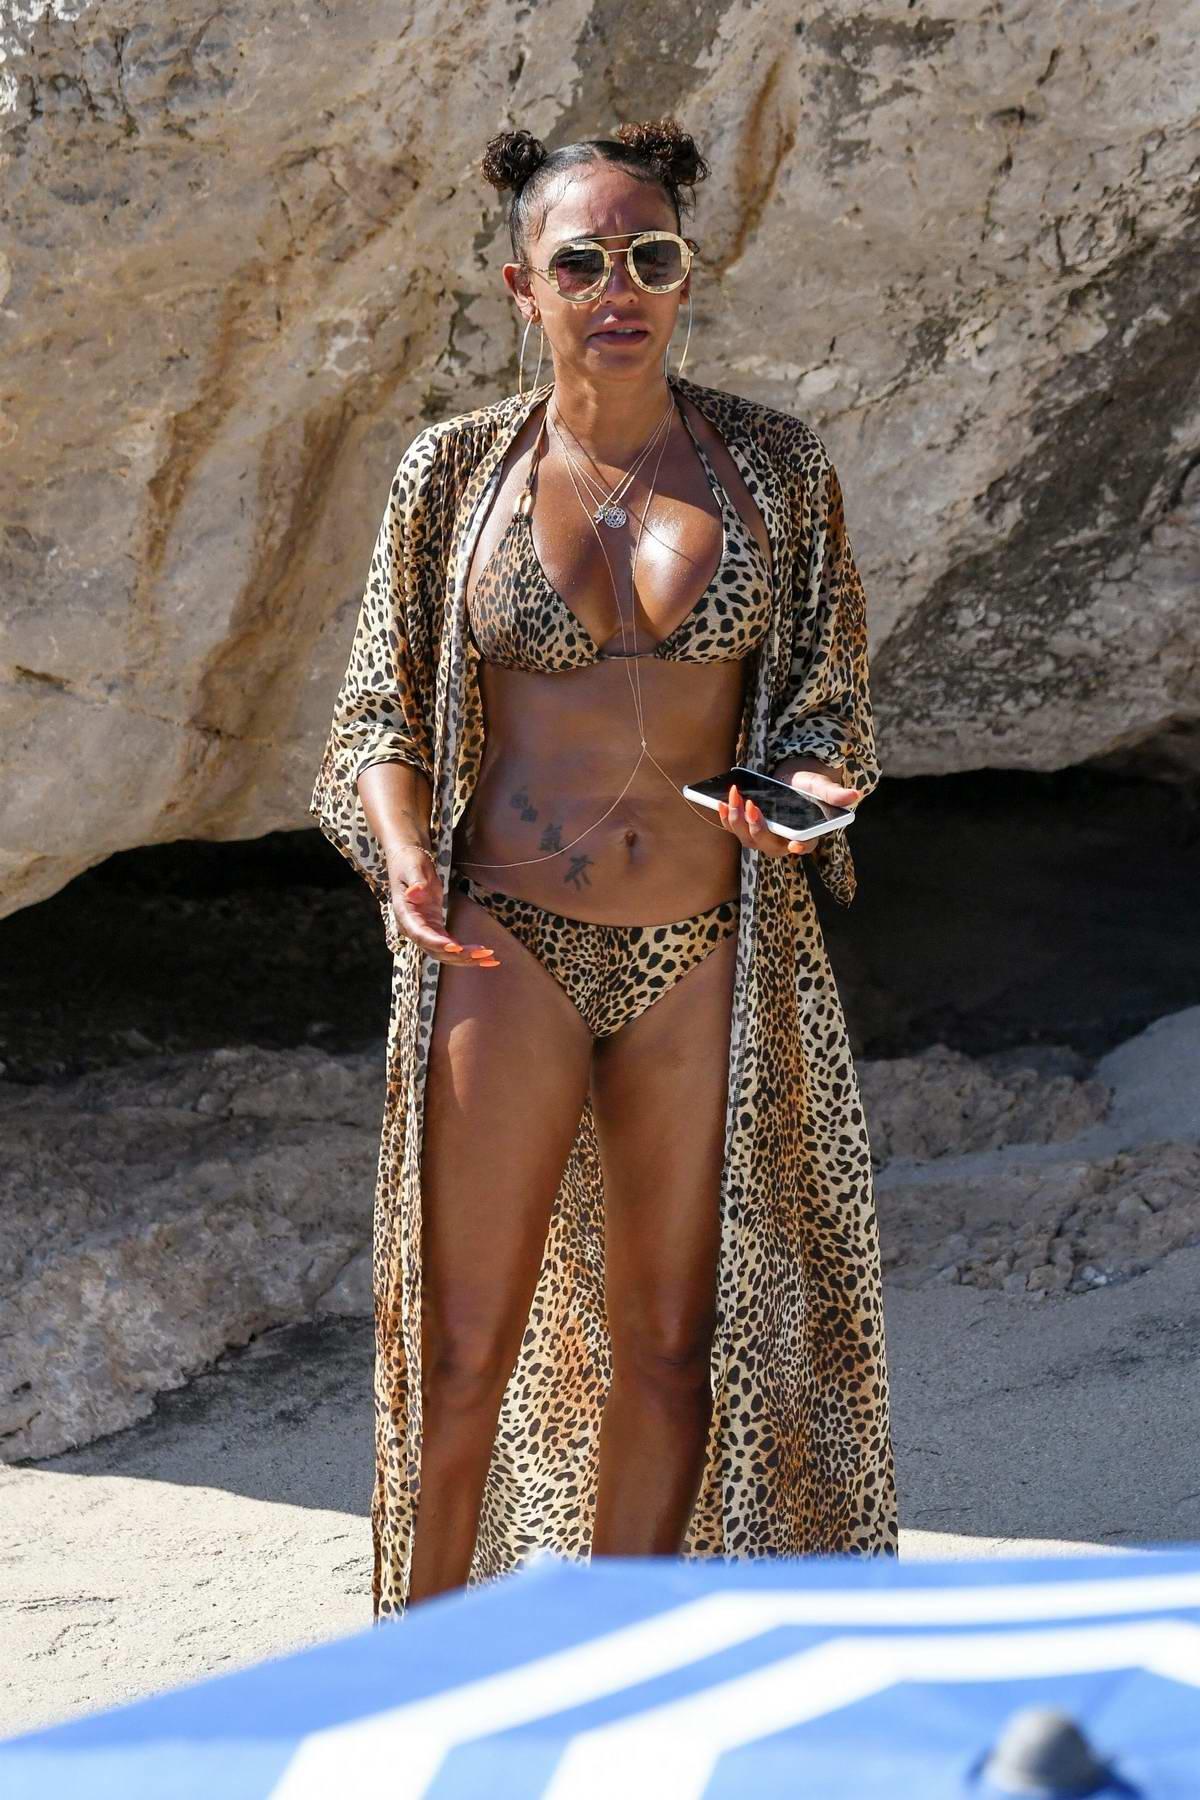 Melanie Brown wears a leopard print bikini while catching some rays in Capri, Italy